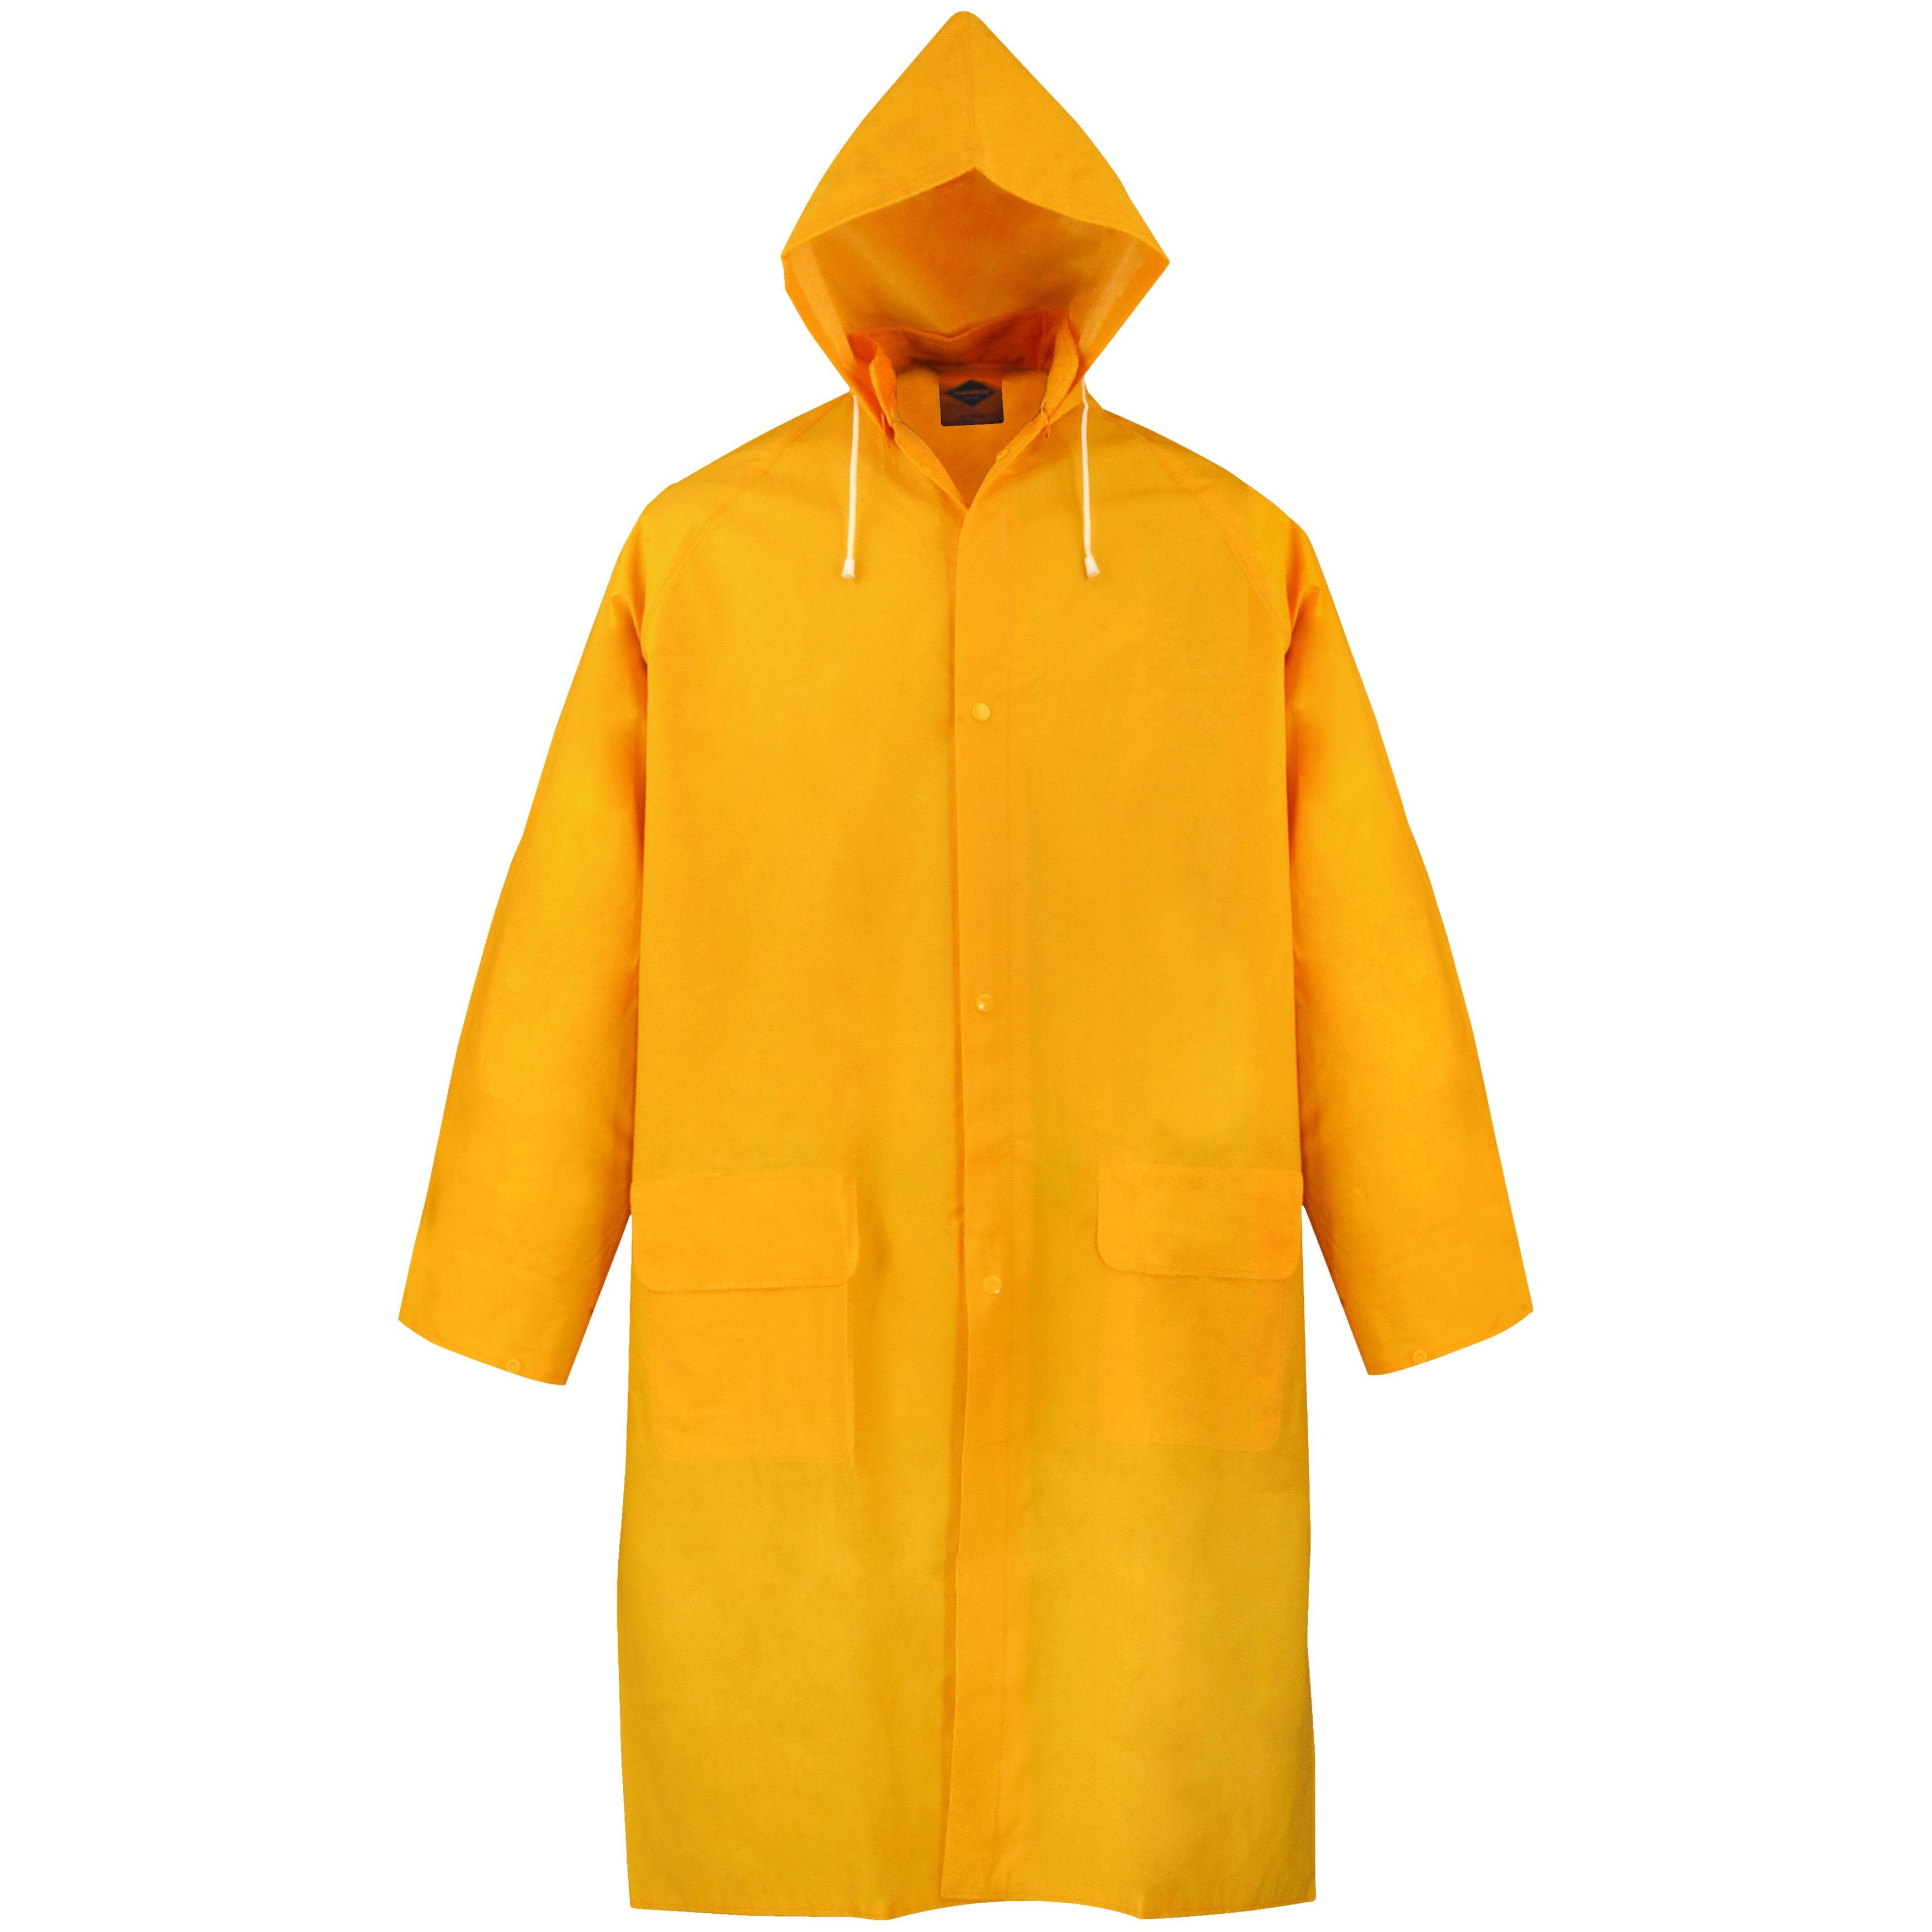 Picture of Diamondback PY-800XL Raincoat, XL, Polyester/PVC, Yellow, Removable Collar